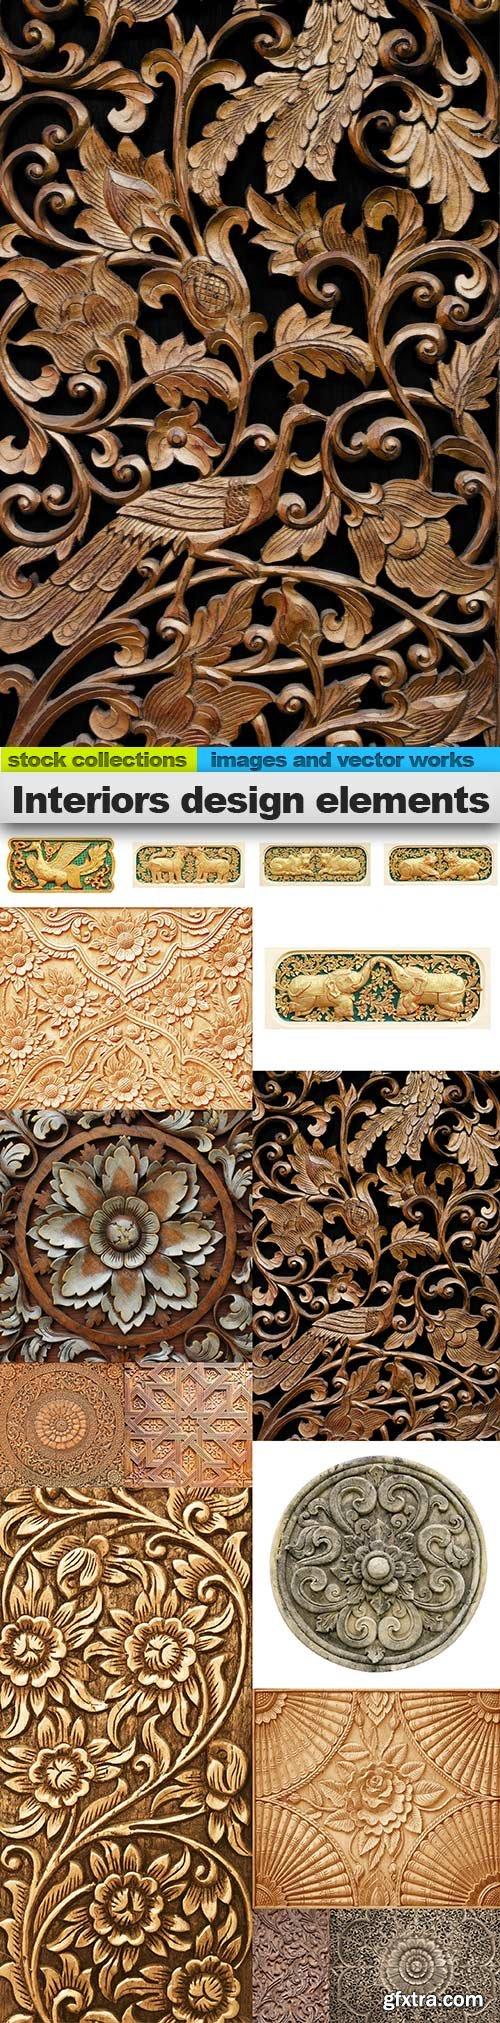 Interiors design elements, 15 x UHQ JPEG